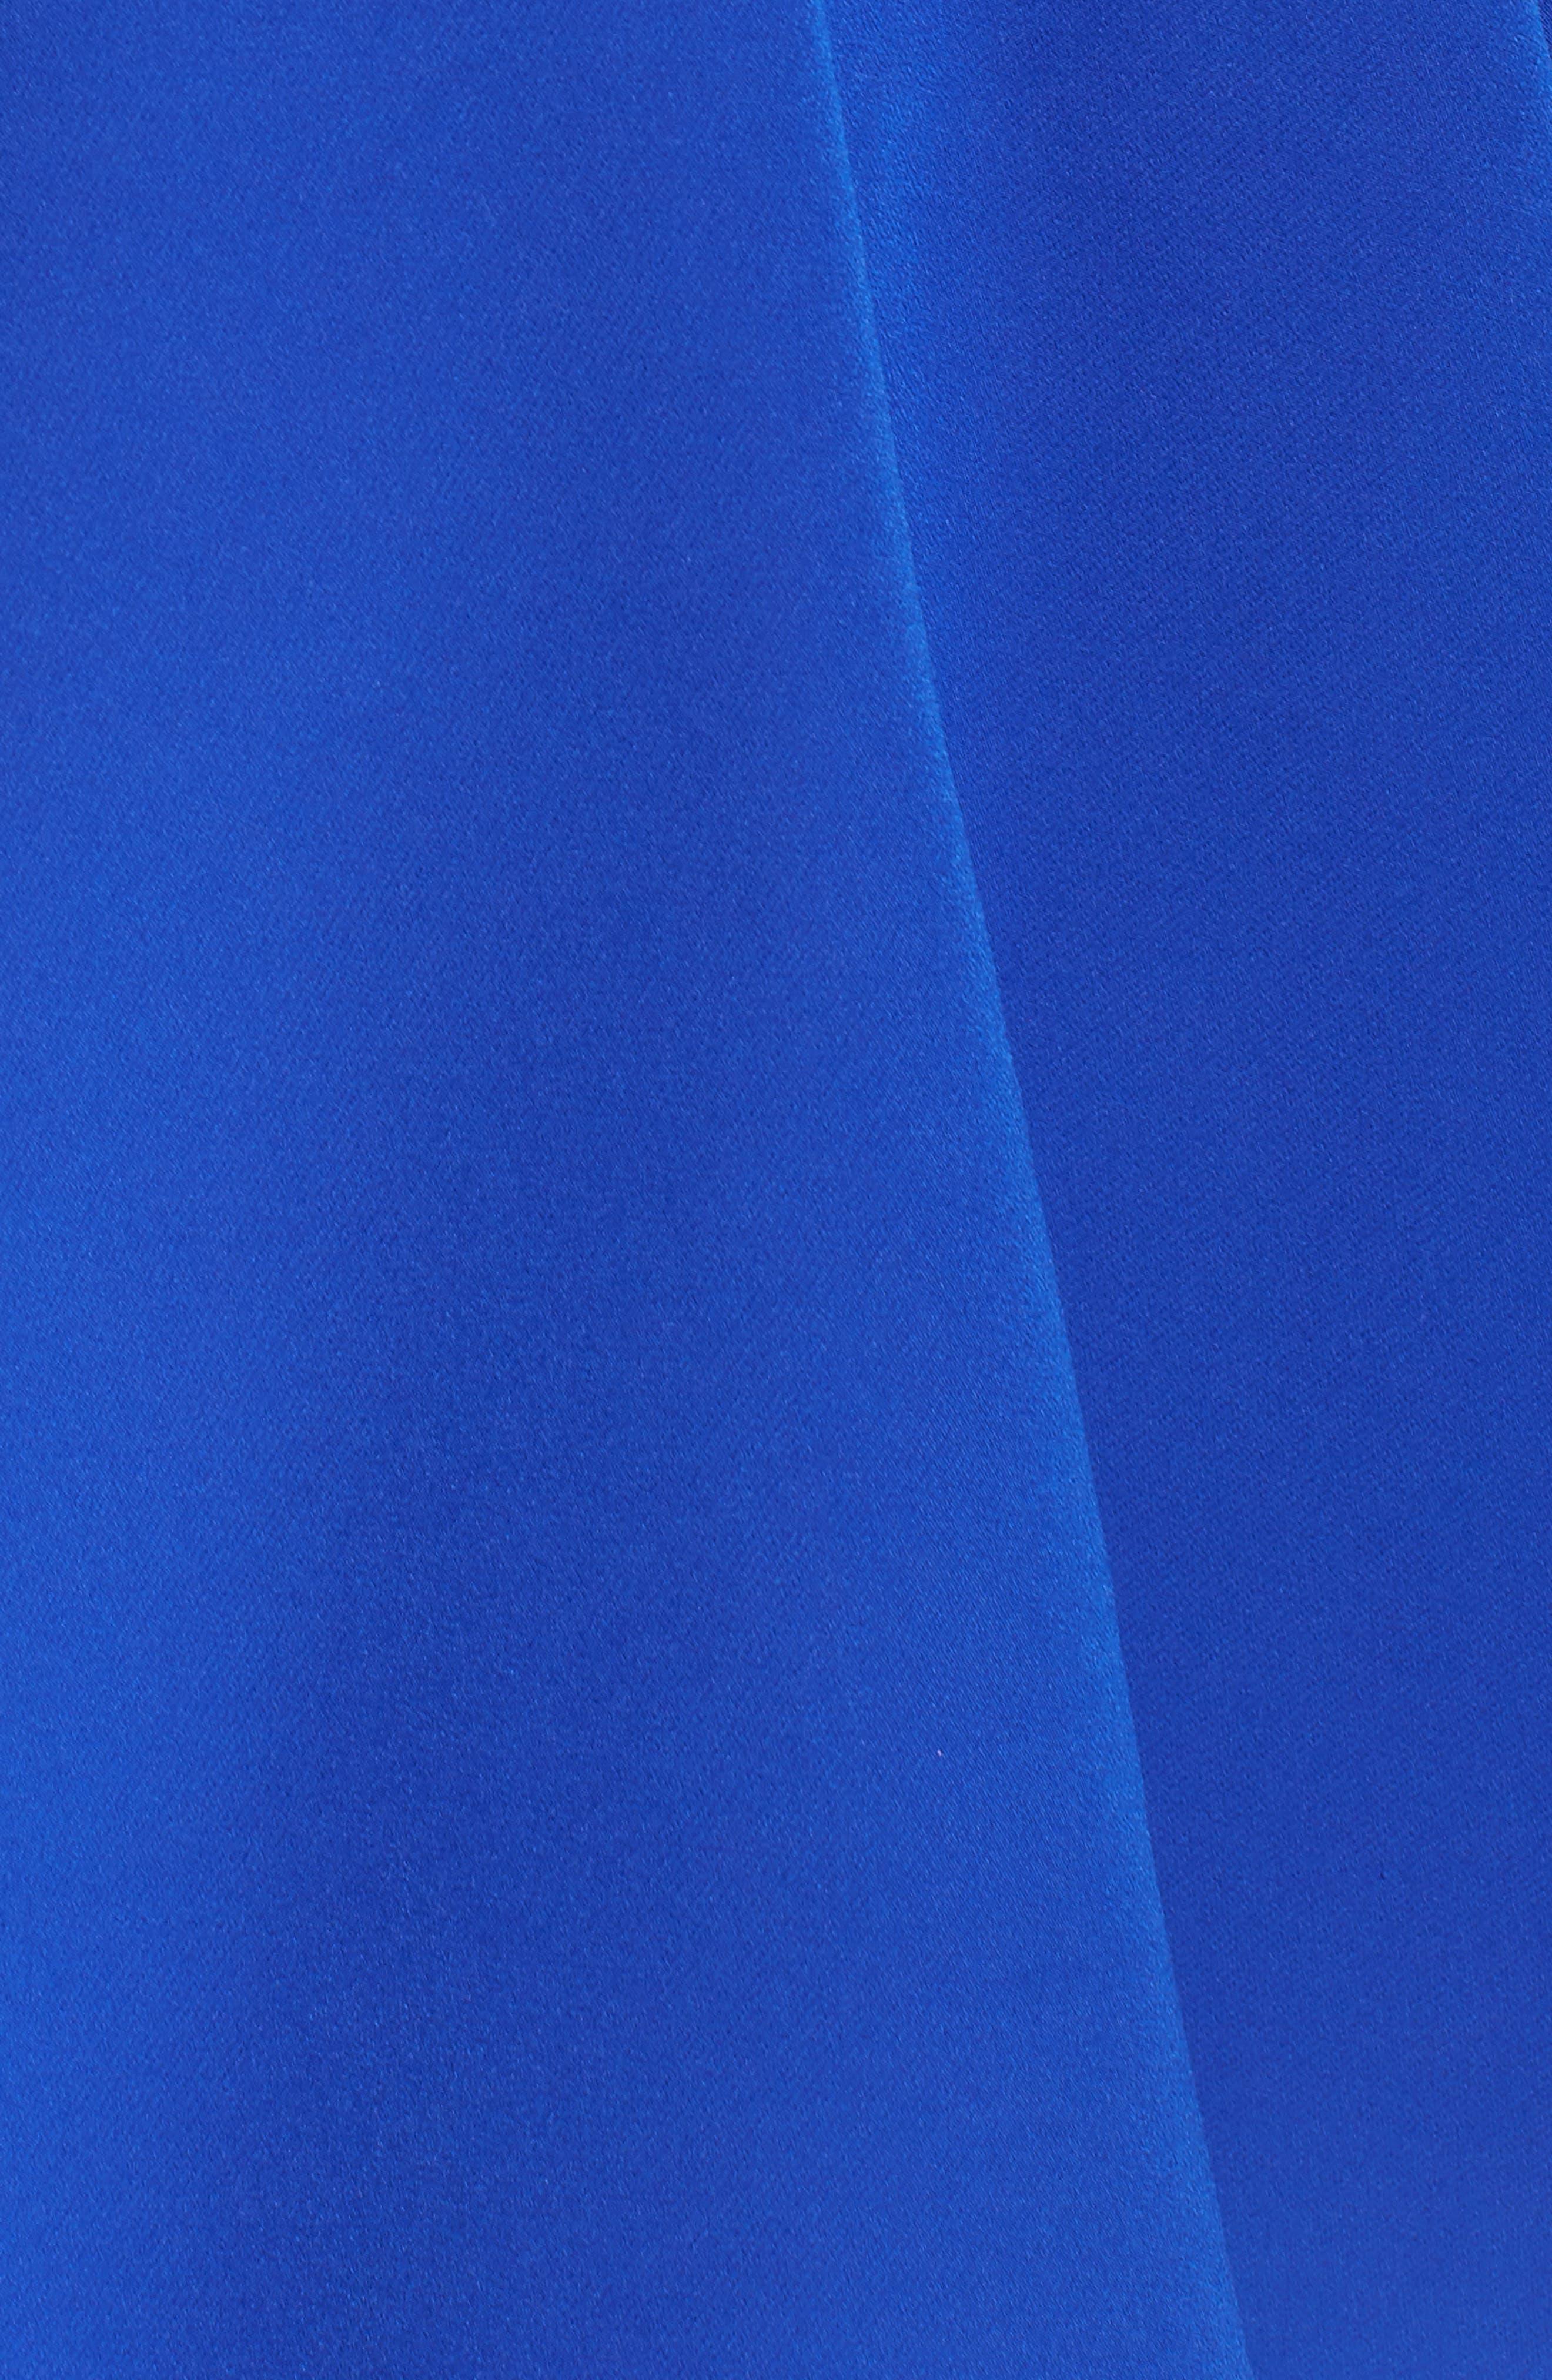 Belted Open Back Fit & Flare Dress,                             Alternate thumbnail 5, color,                             465